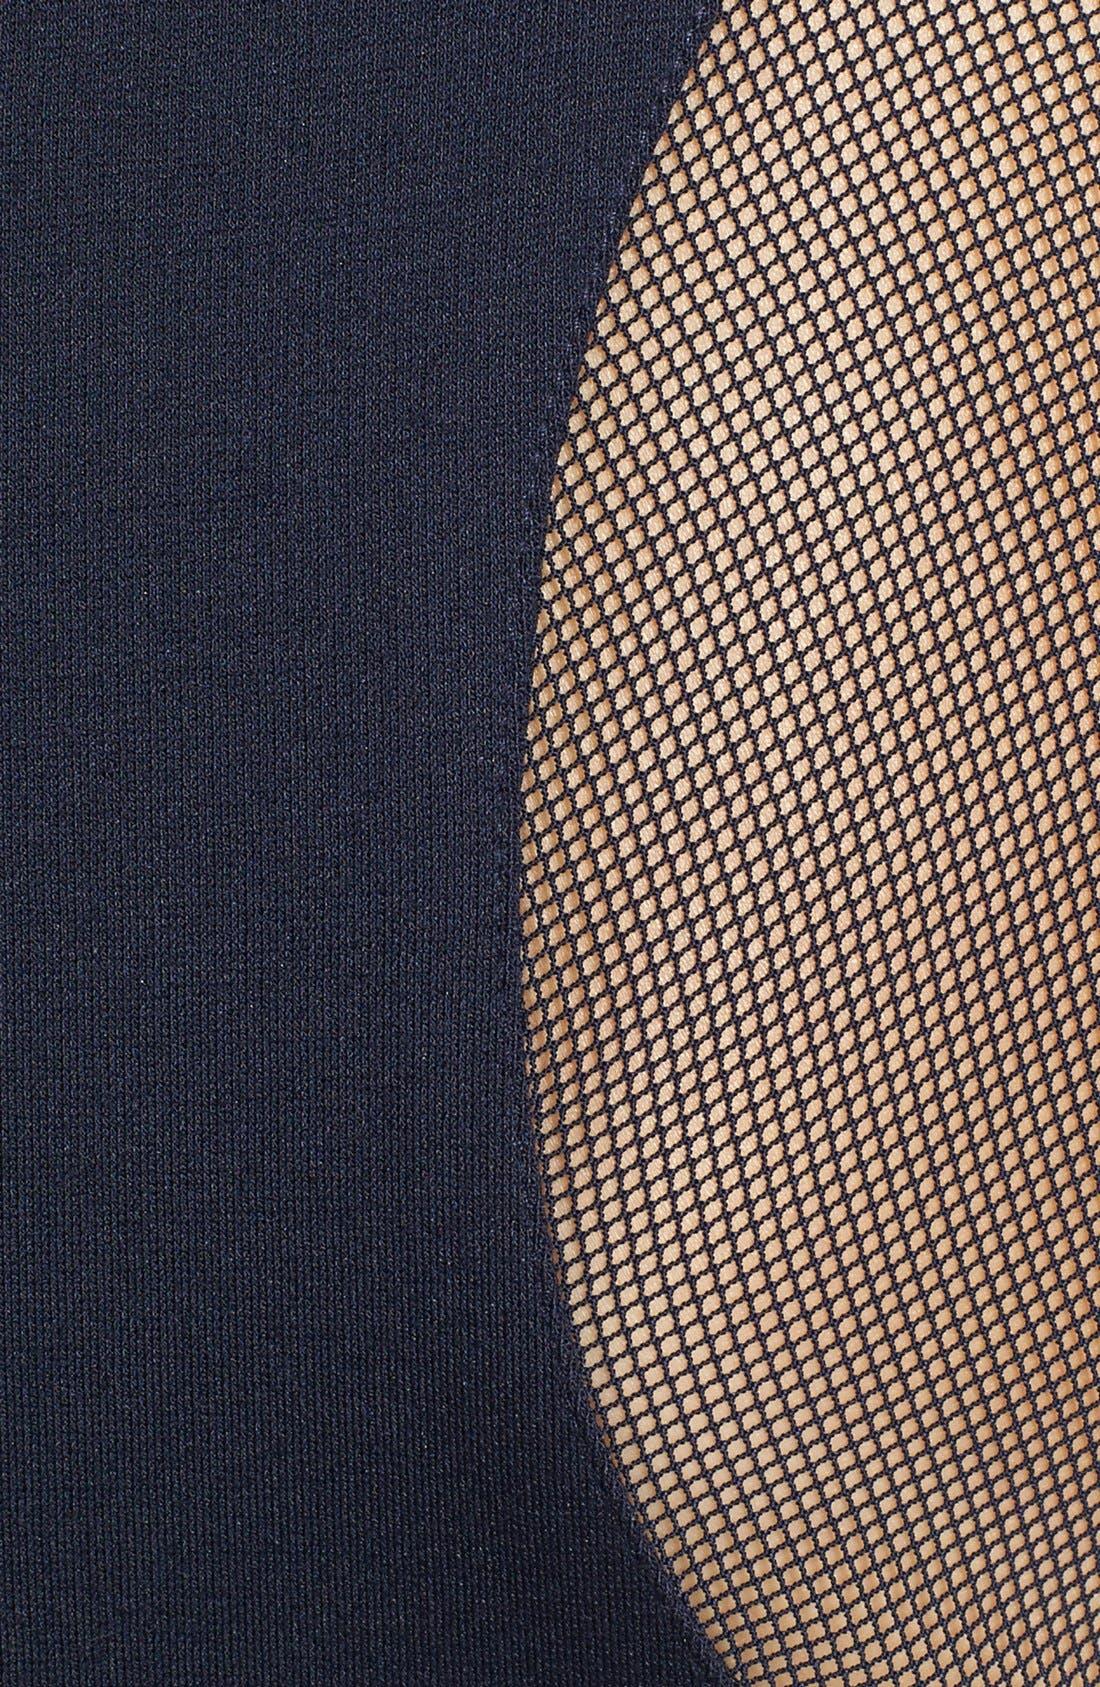 Alternate Image 3  - Vince Camuto Sheer Inset Ponte Dress